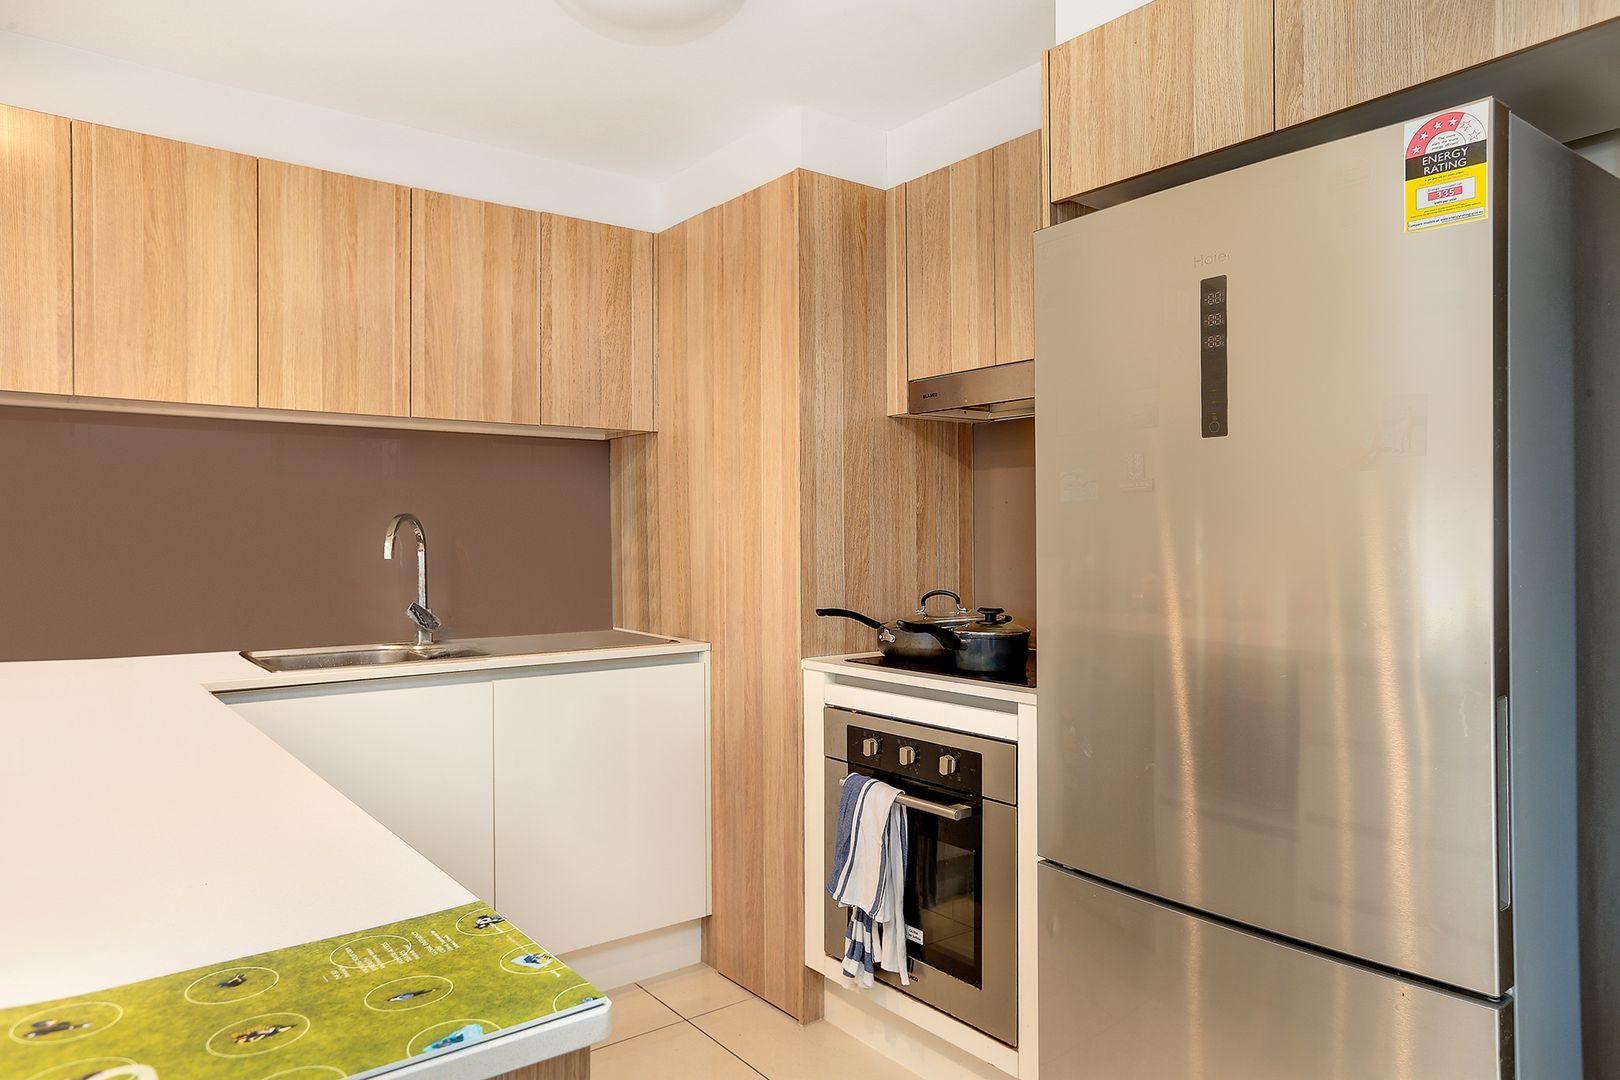 21/11 Lindwall Street, Upper Mount Gravatt QLD 4122, Image 2